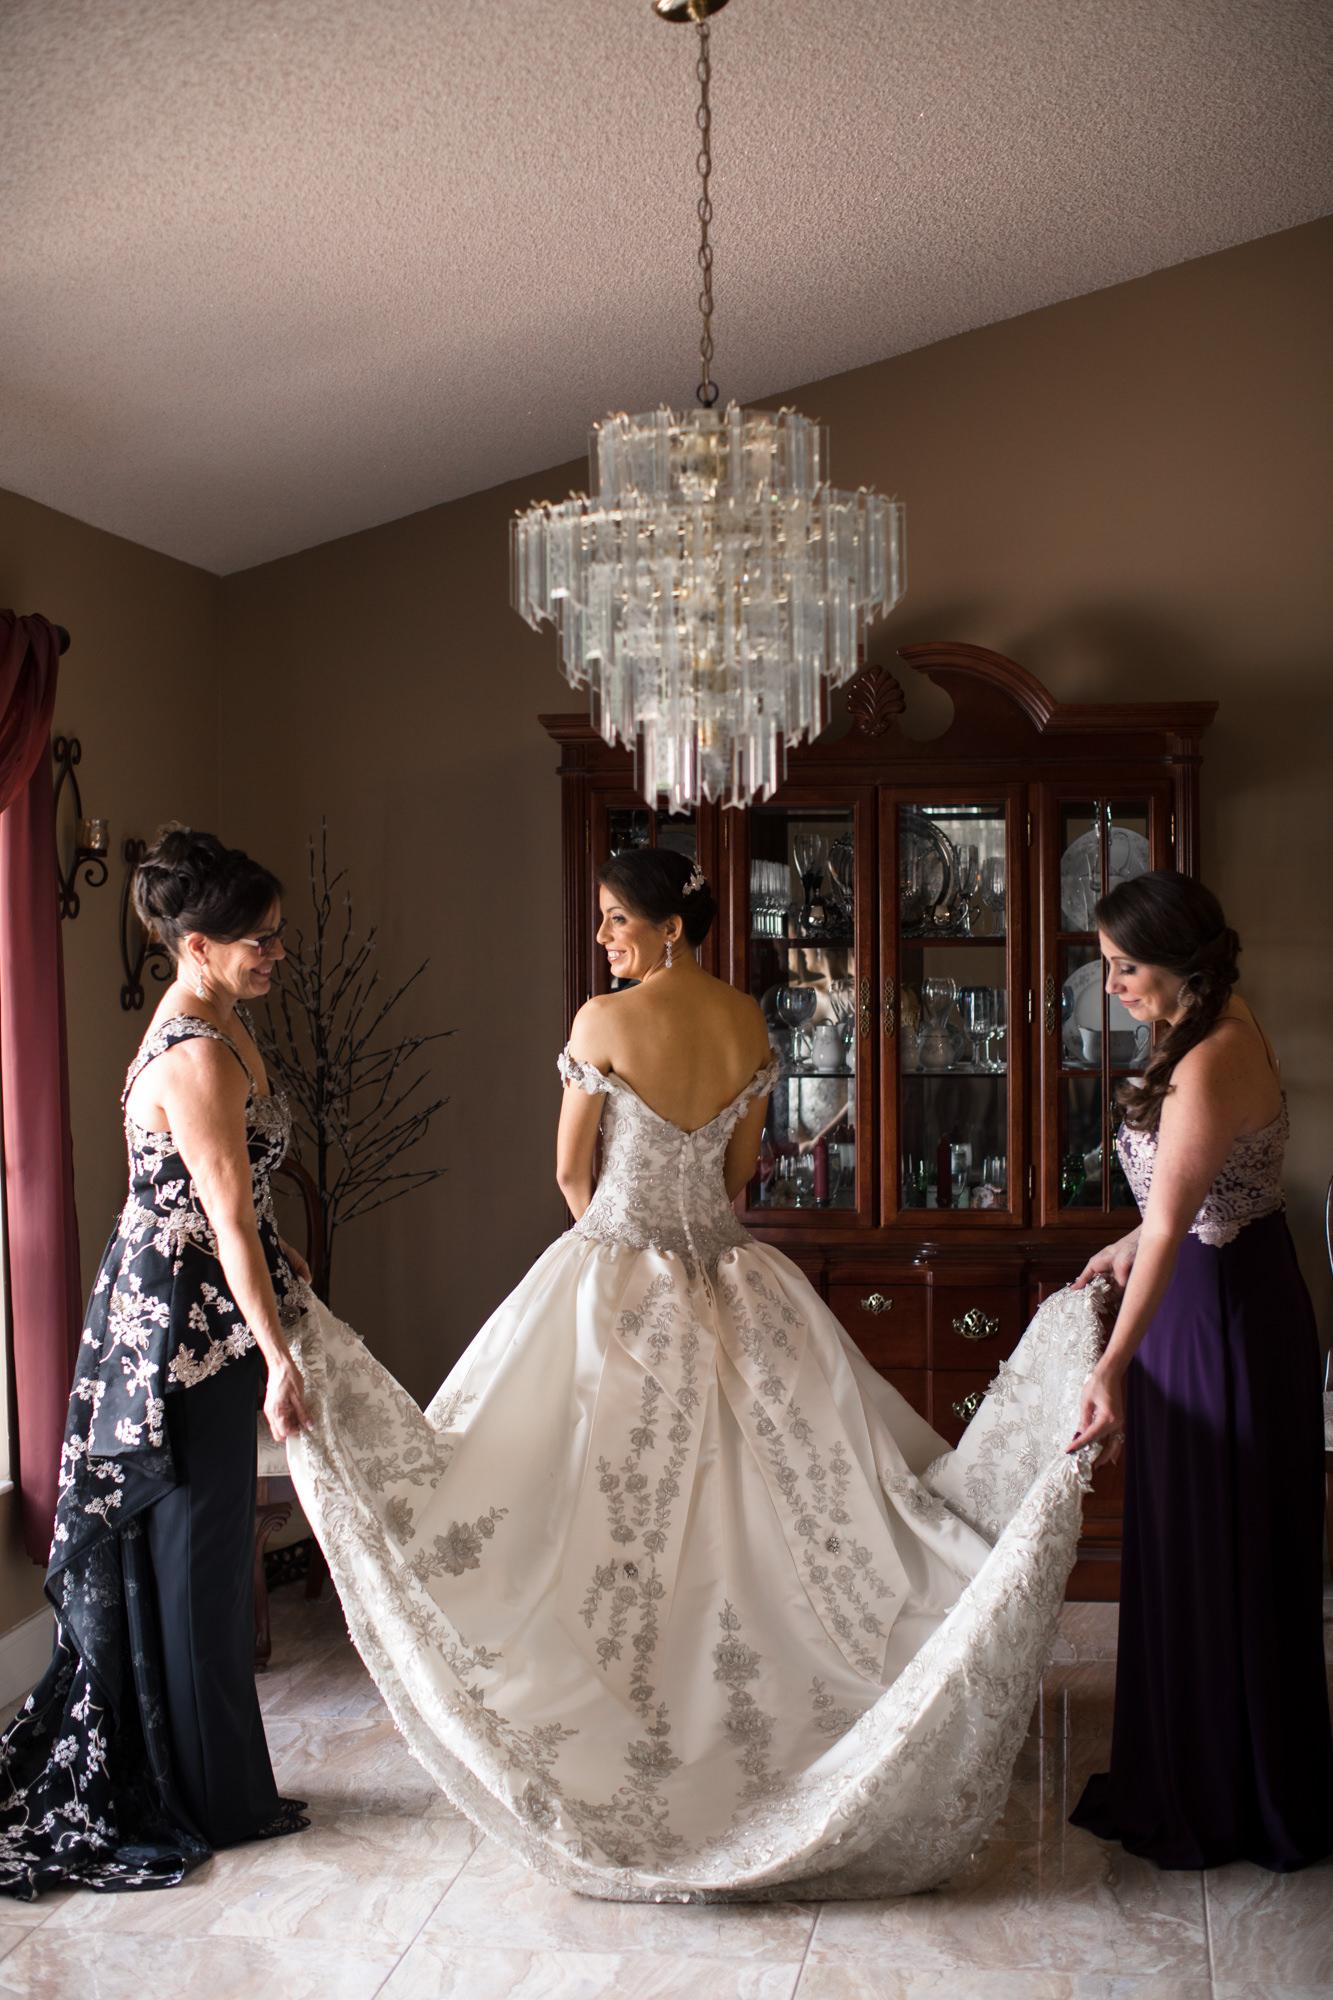 Benvenuto_Wedding_catholic_Florida_Bride-Groom-11.jpg